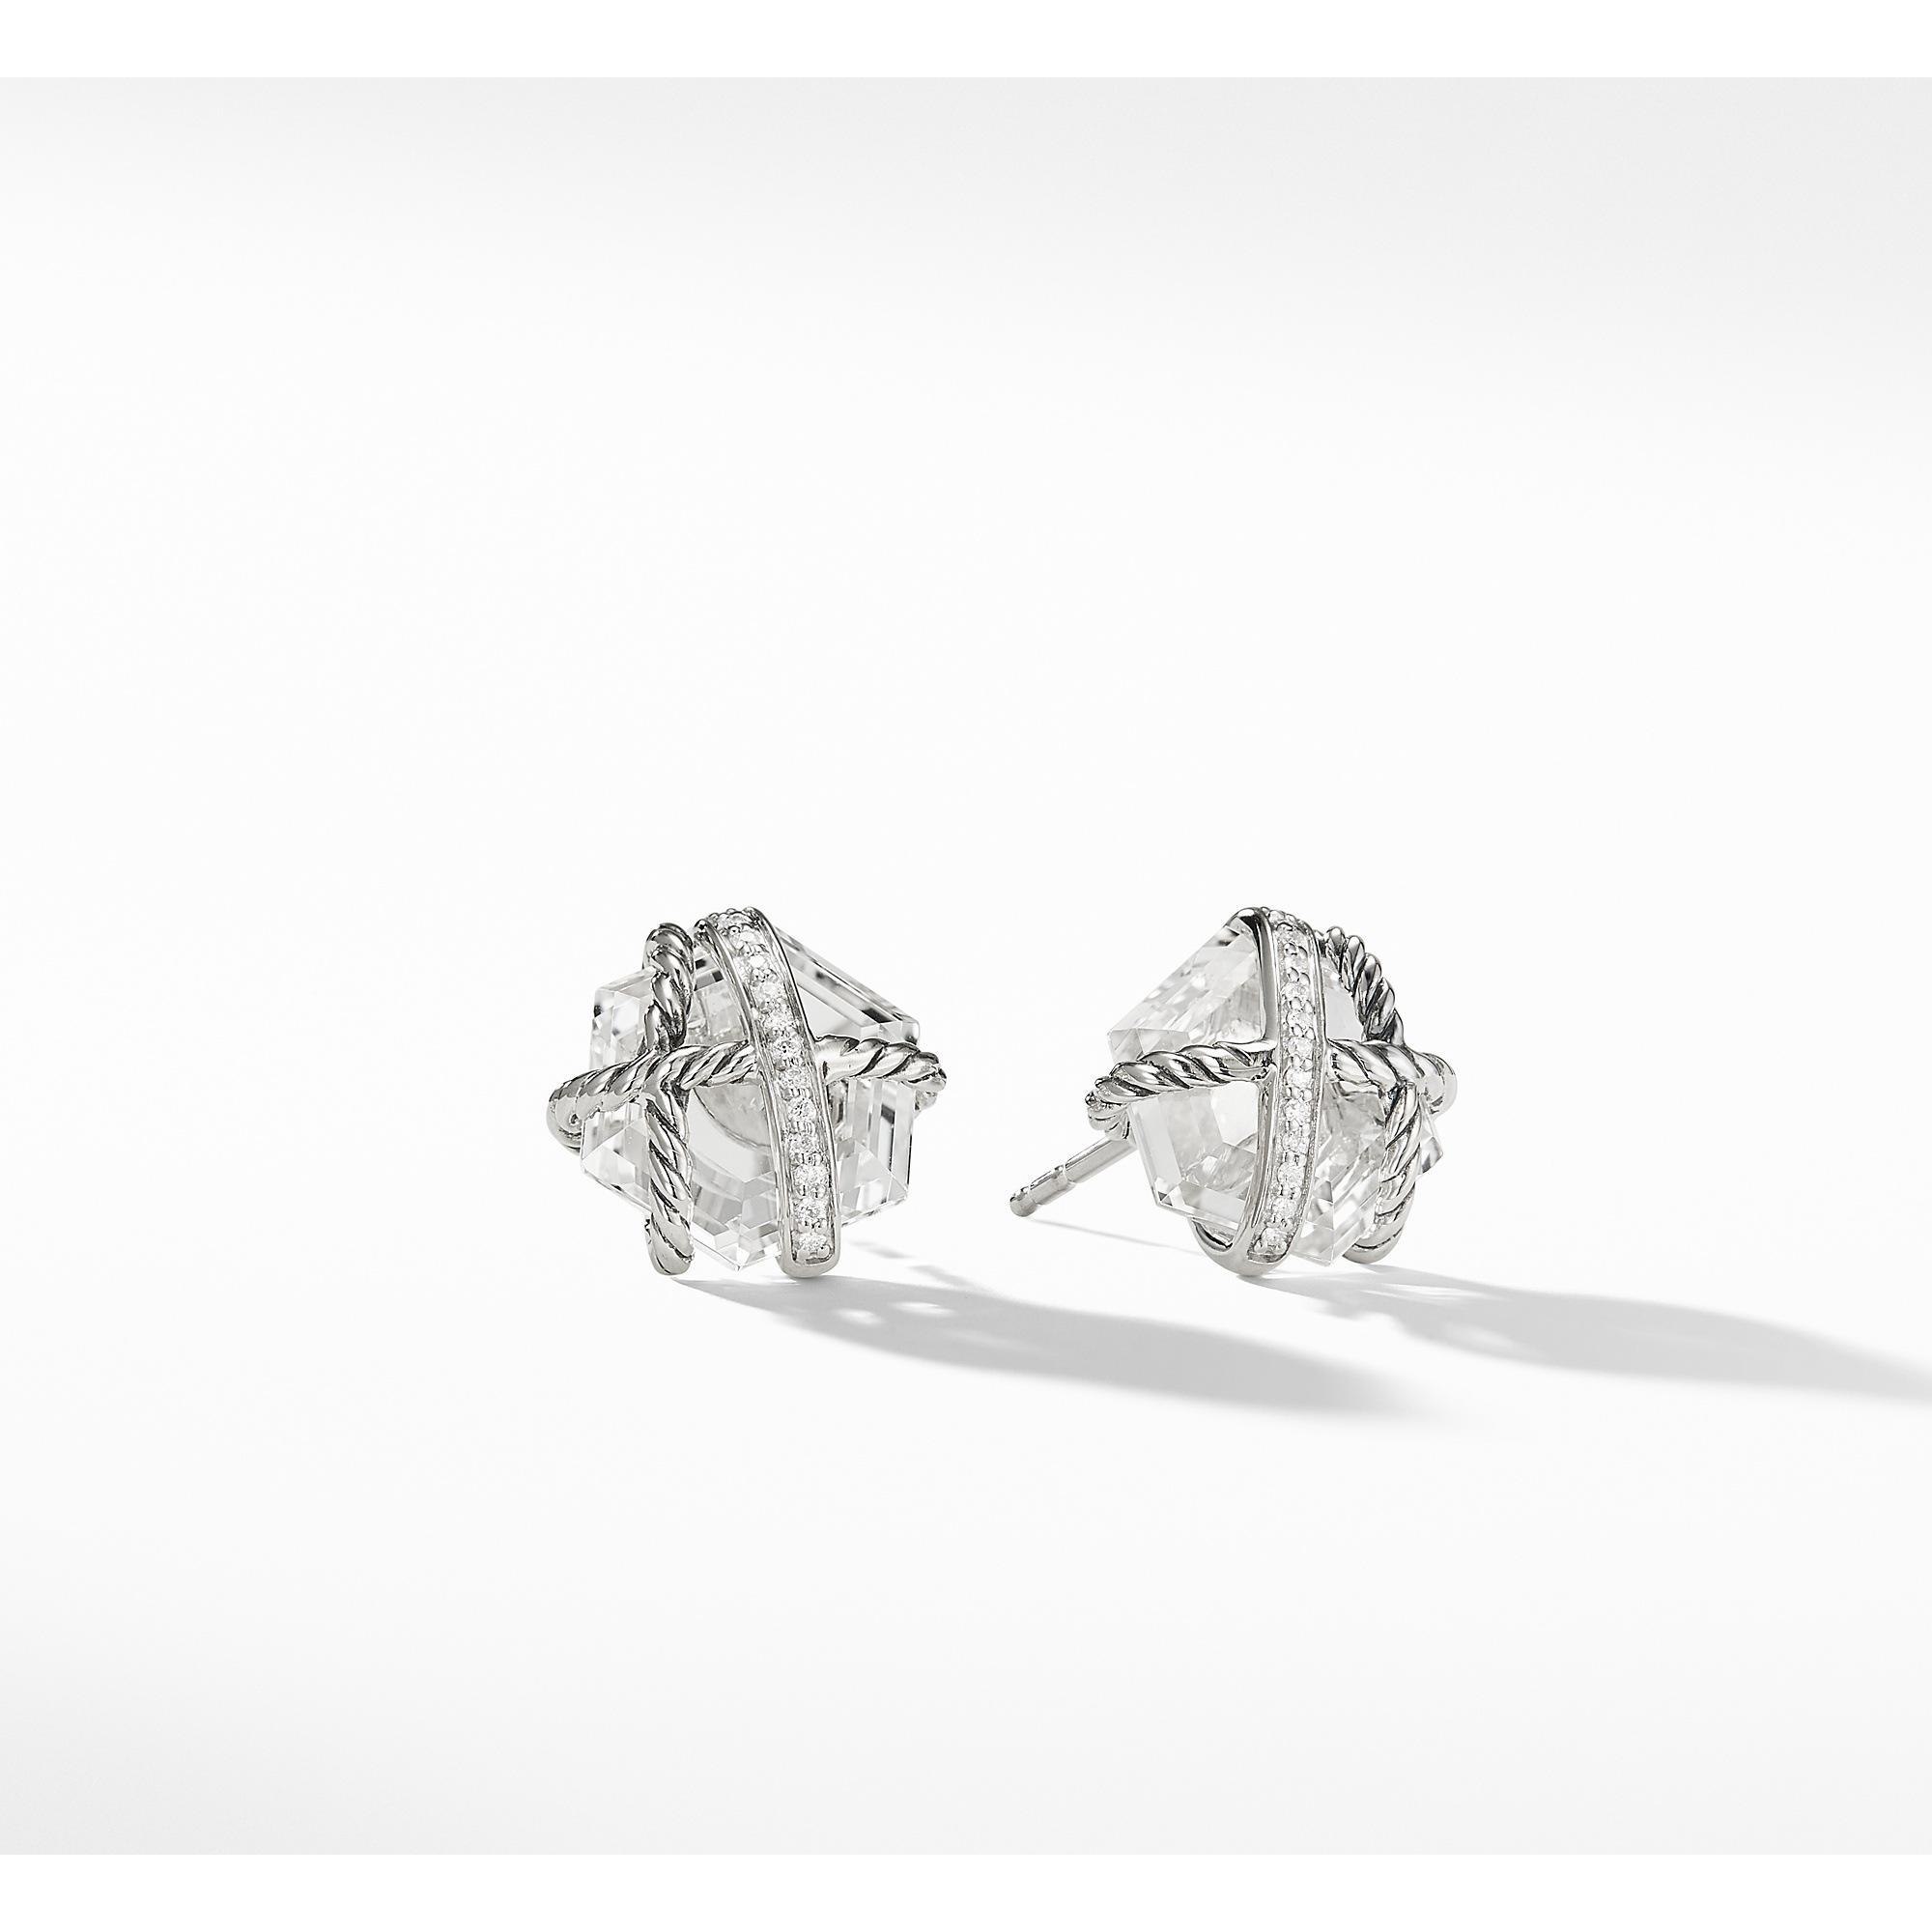 David Yurman Women S Cable Wrap Earrings With Crystal